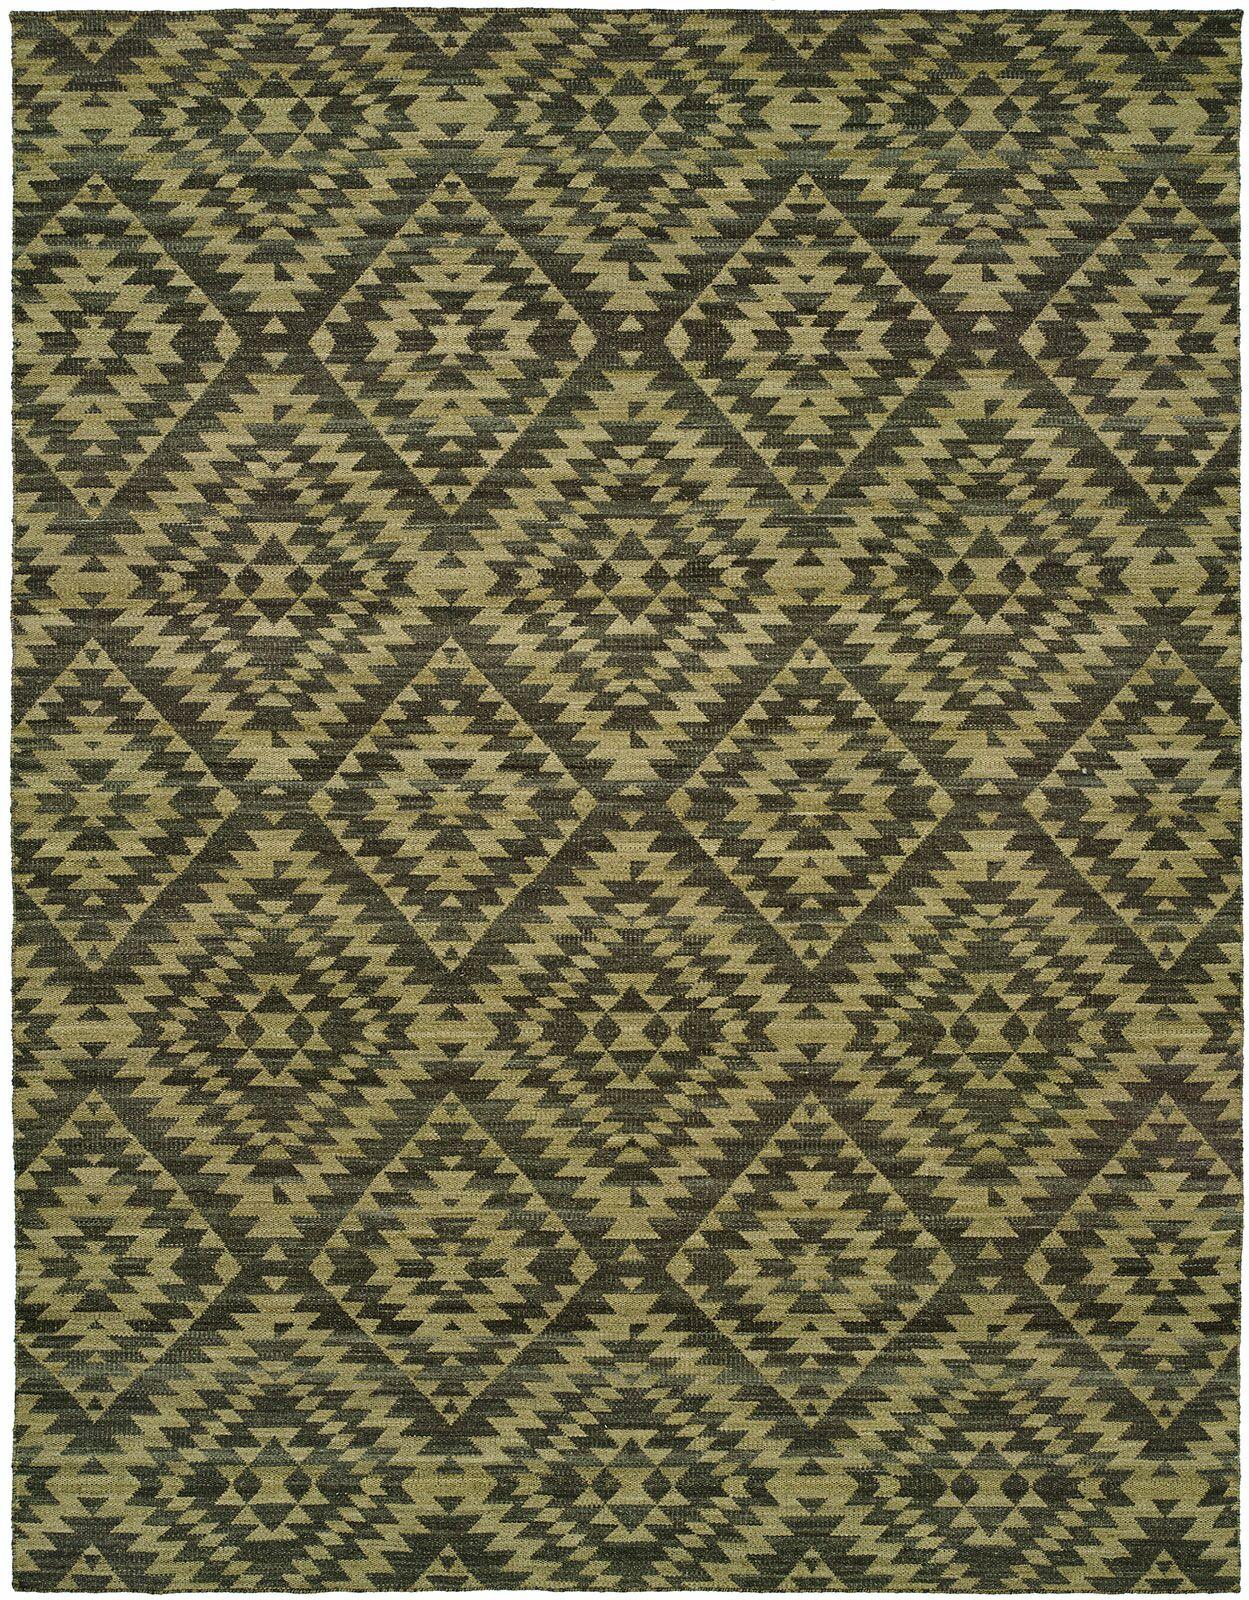 Ford Handmade Camel/Green Area Rug Rug Size: 4' x 6'